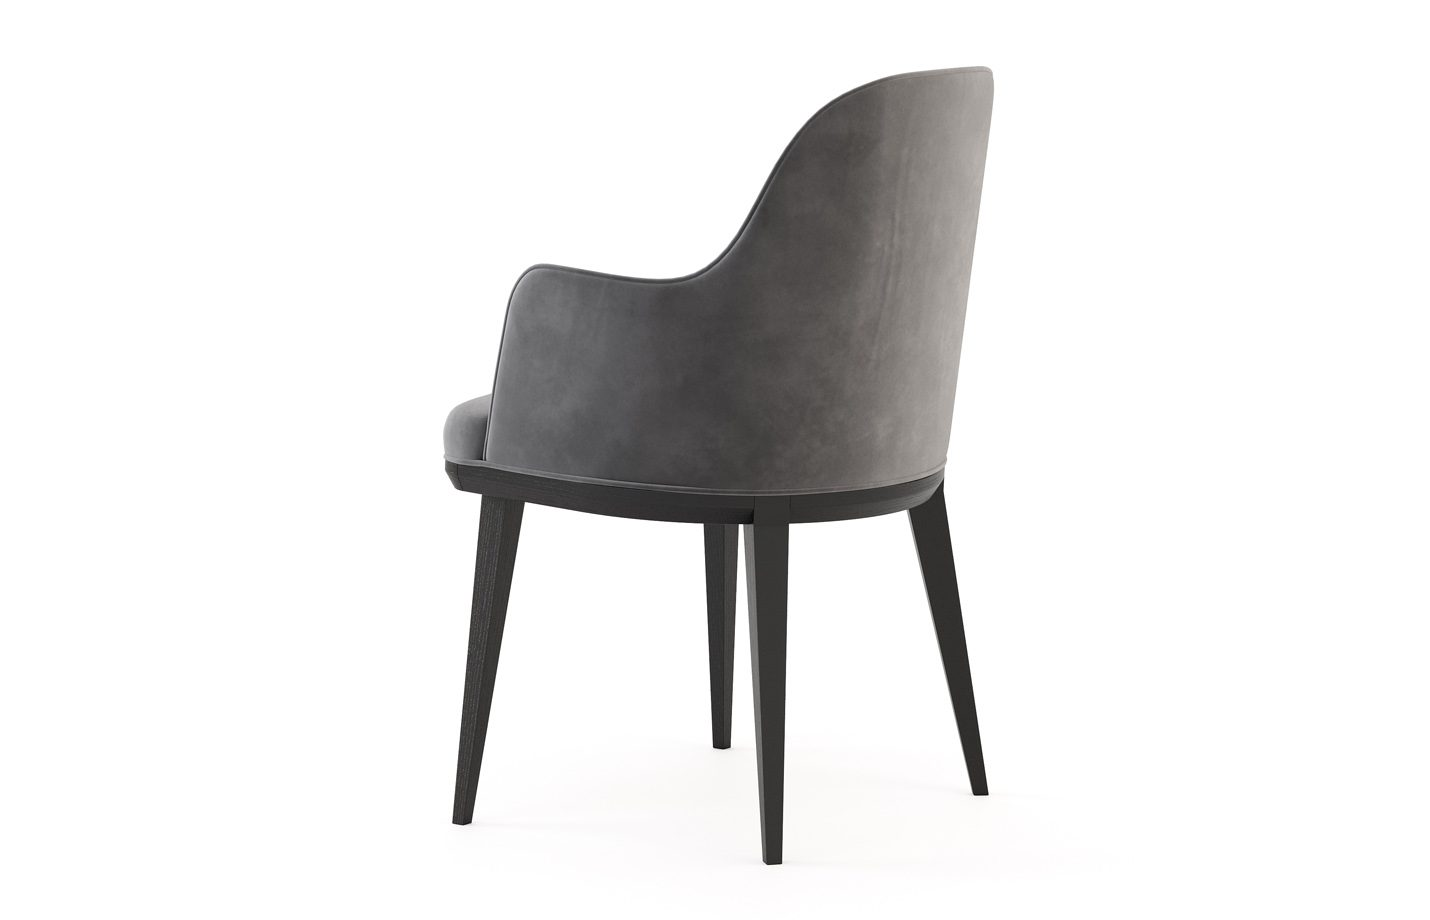 Fritillary-Armchair-by-fabiia-furniture-signature-4